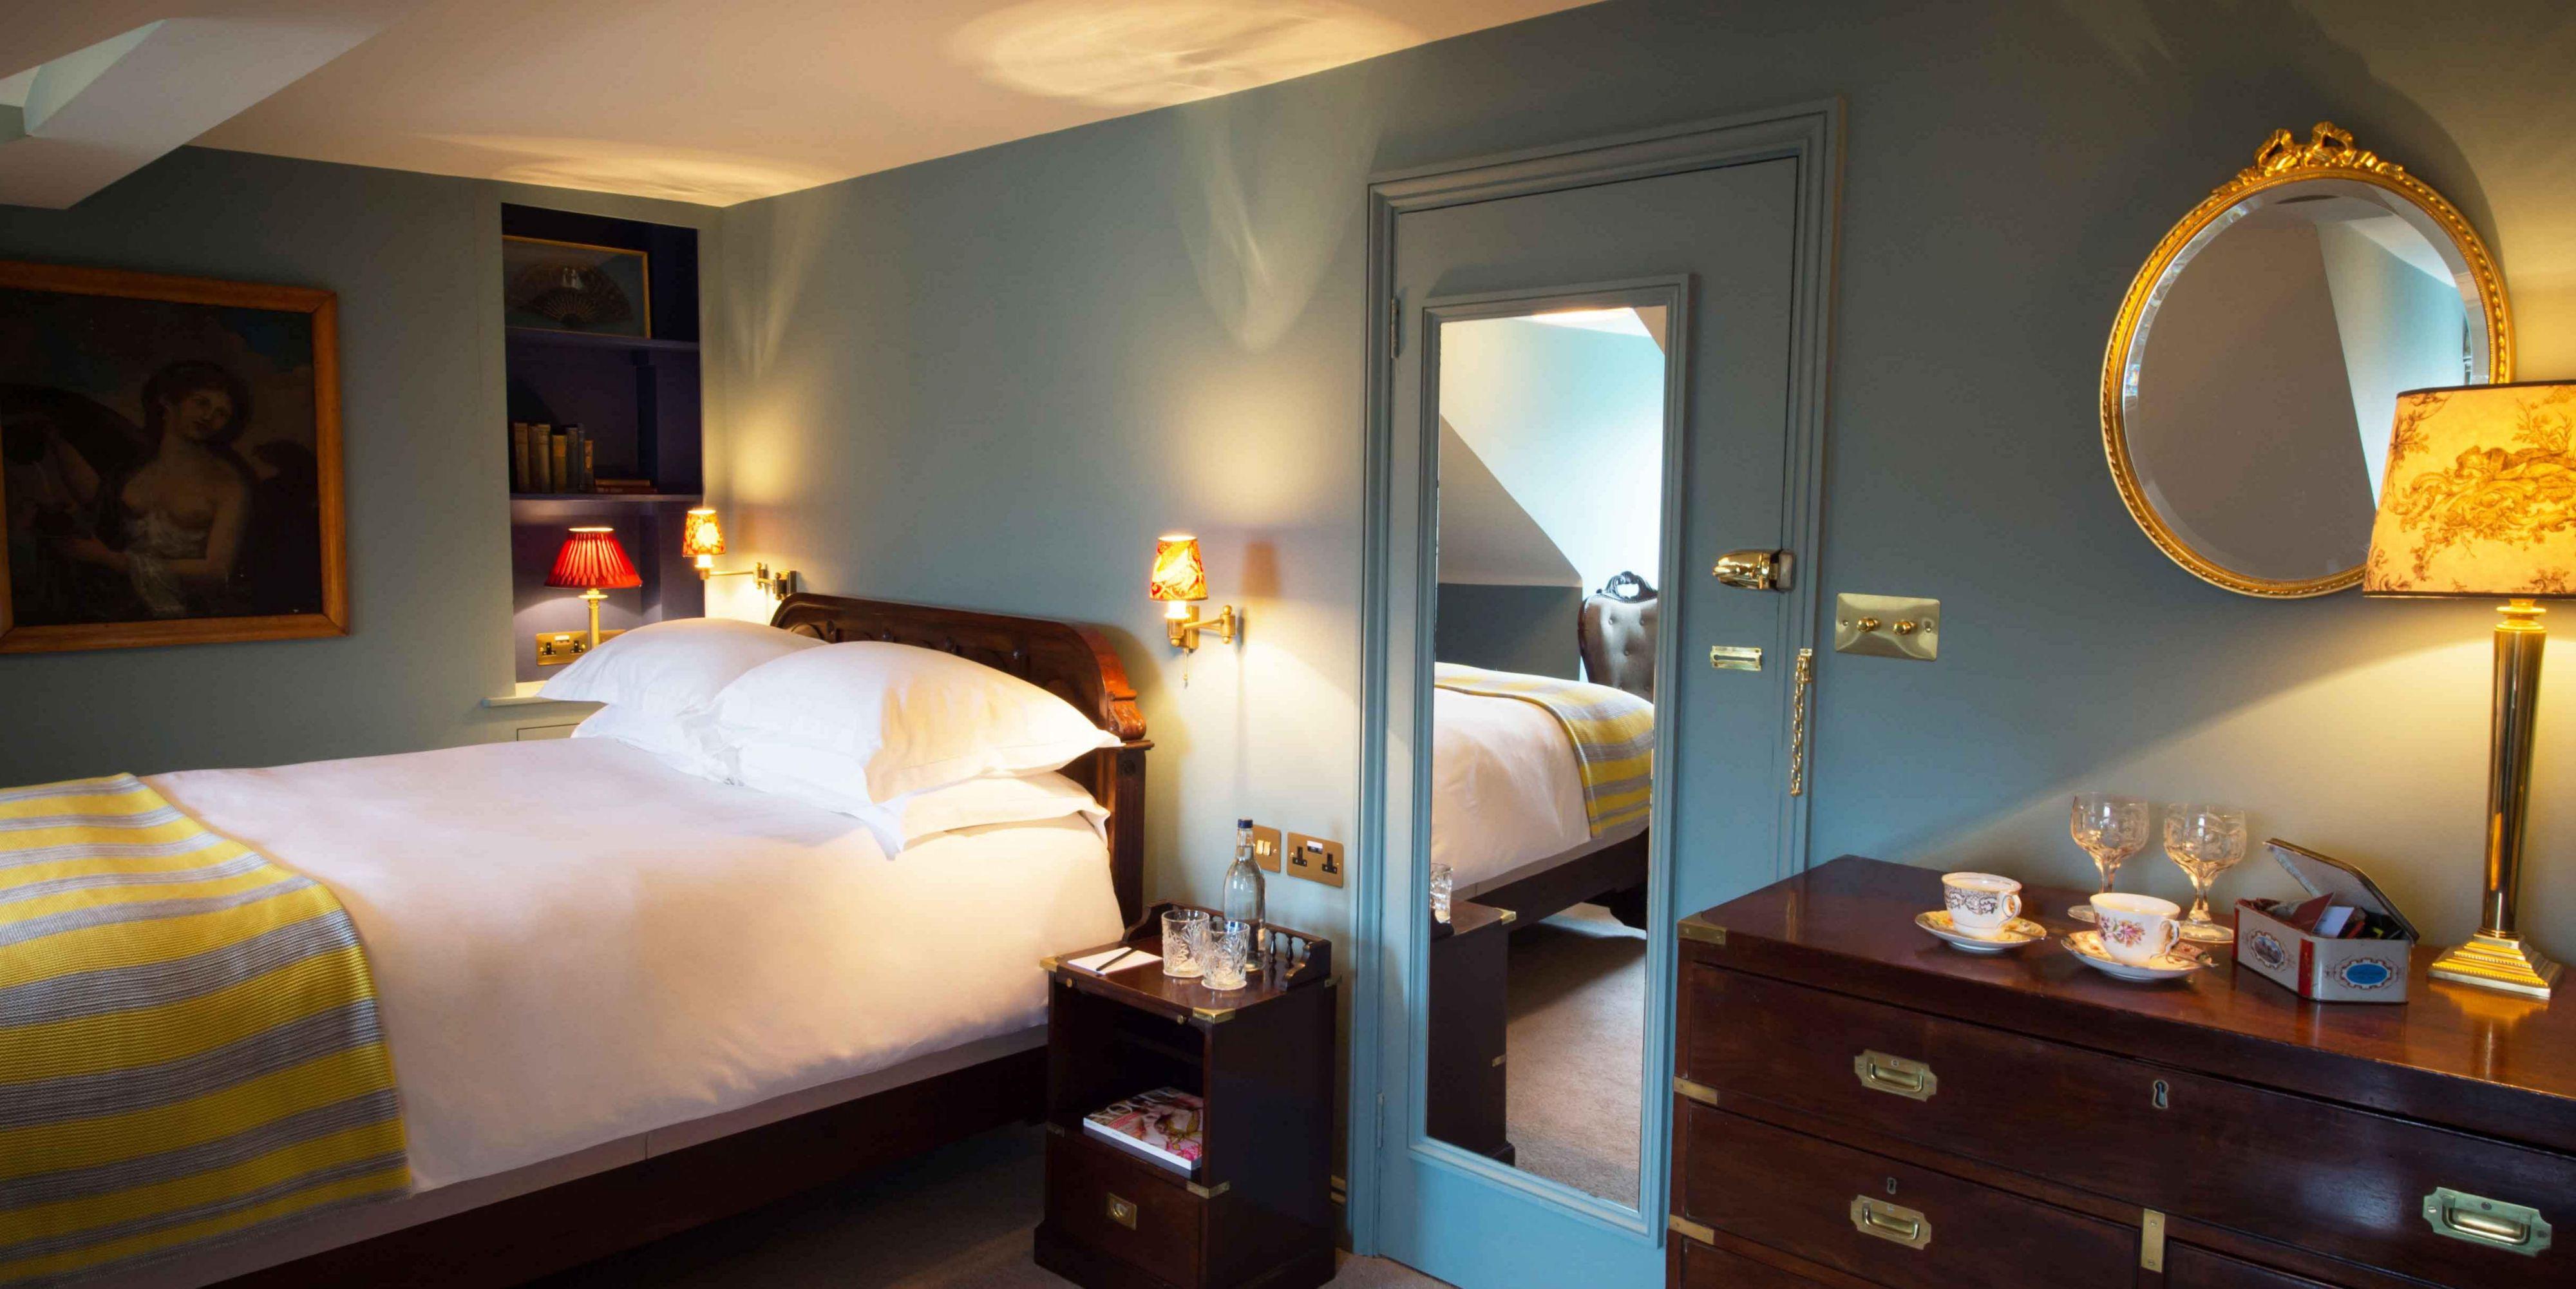 Jolly Good bedroom